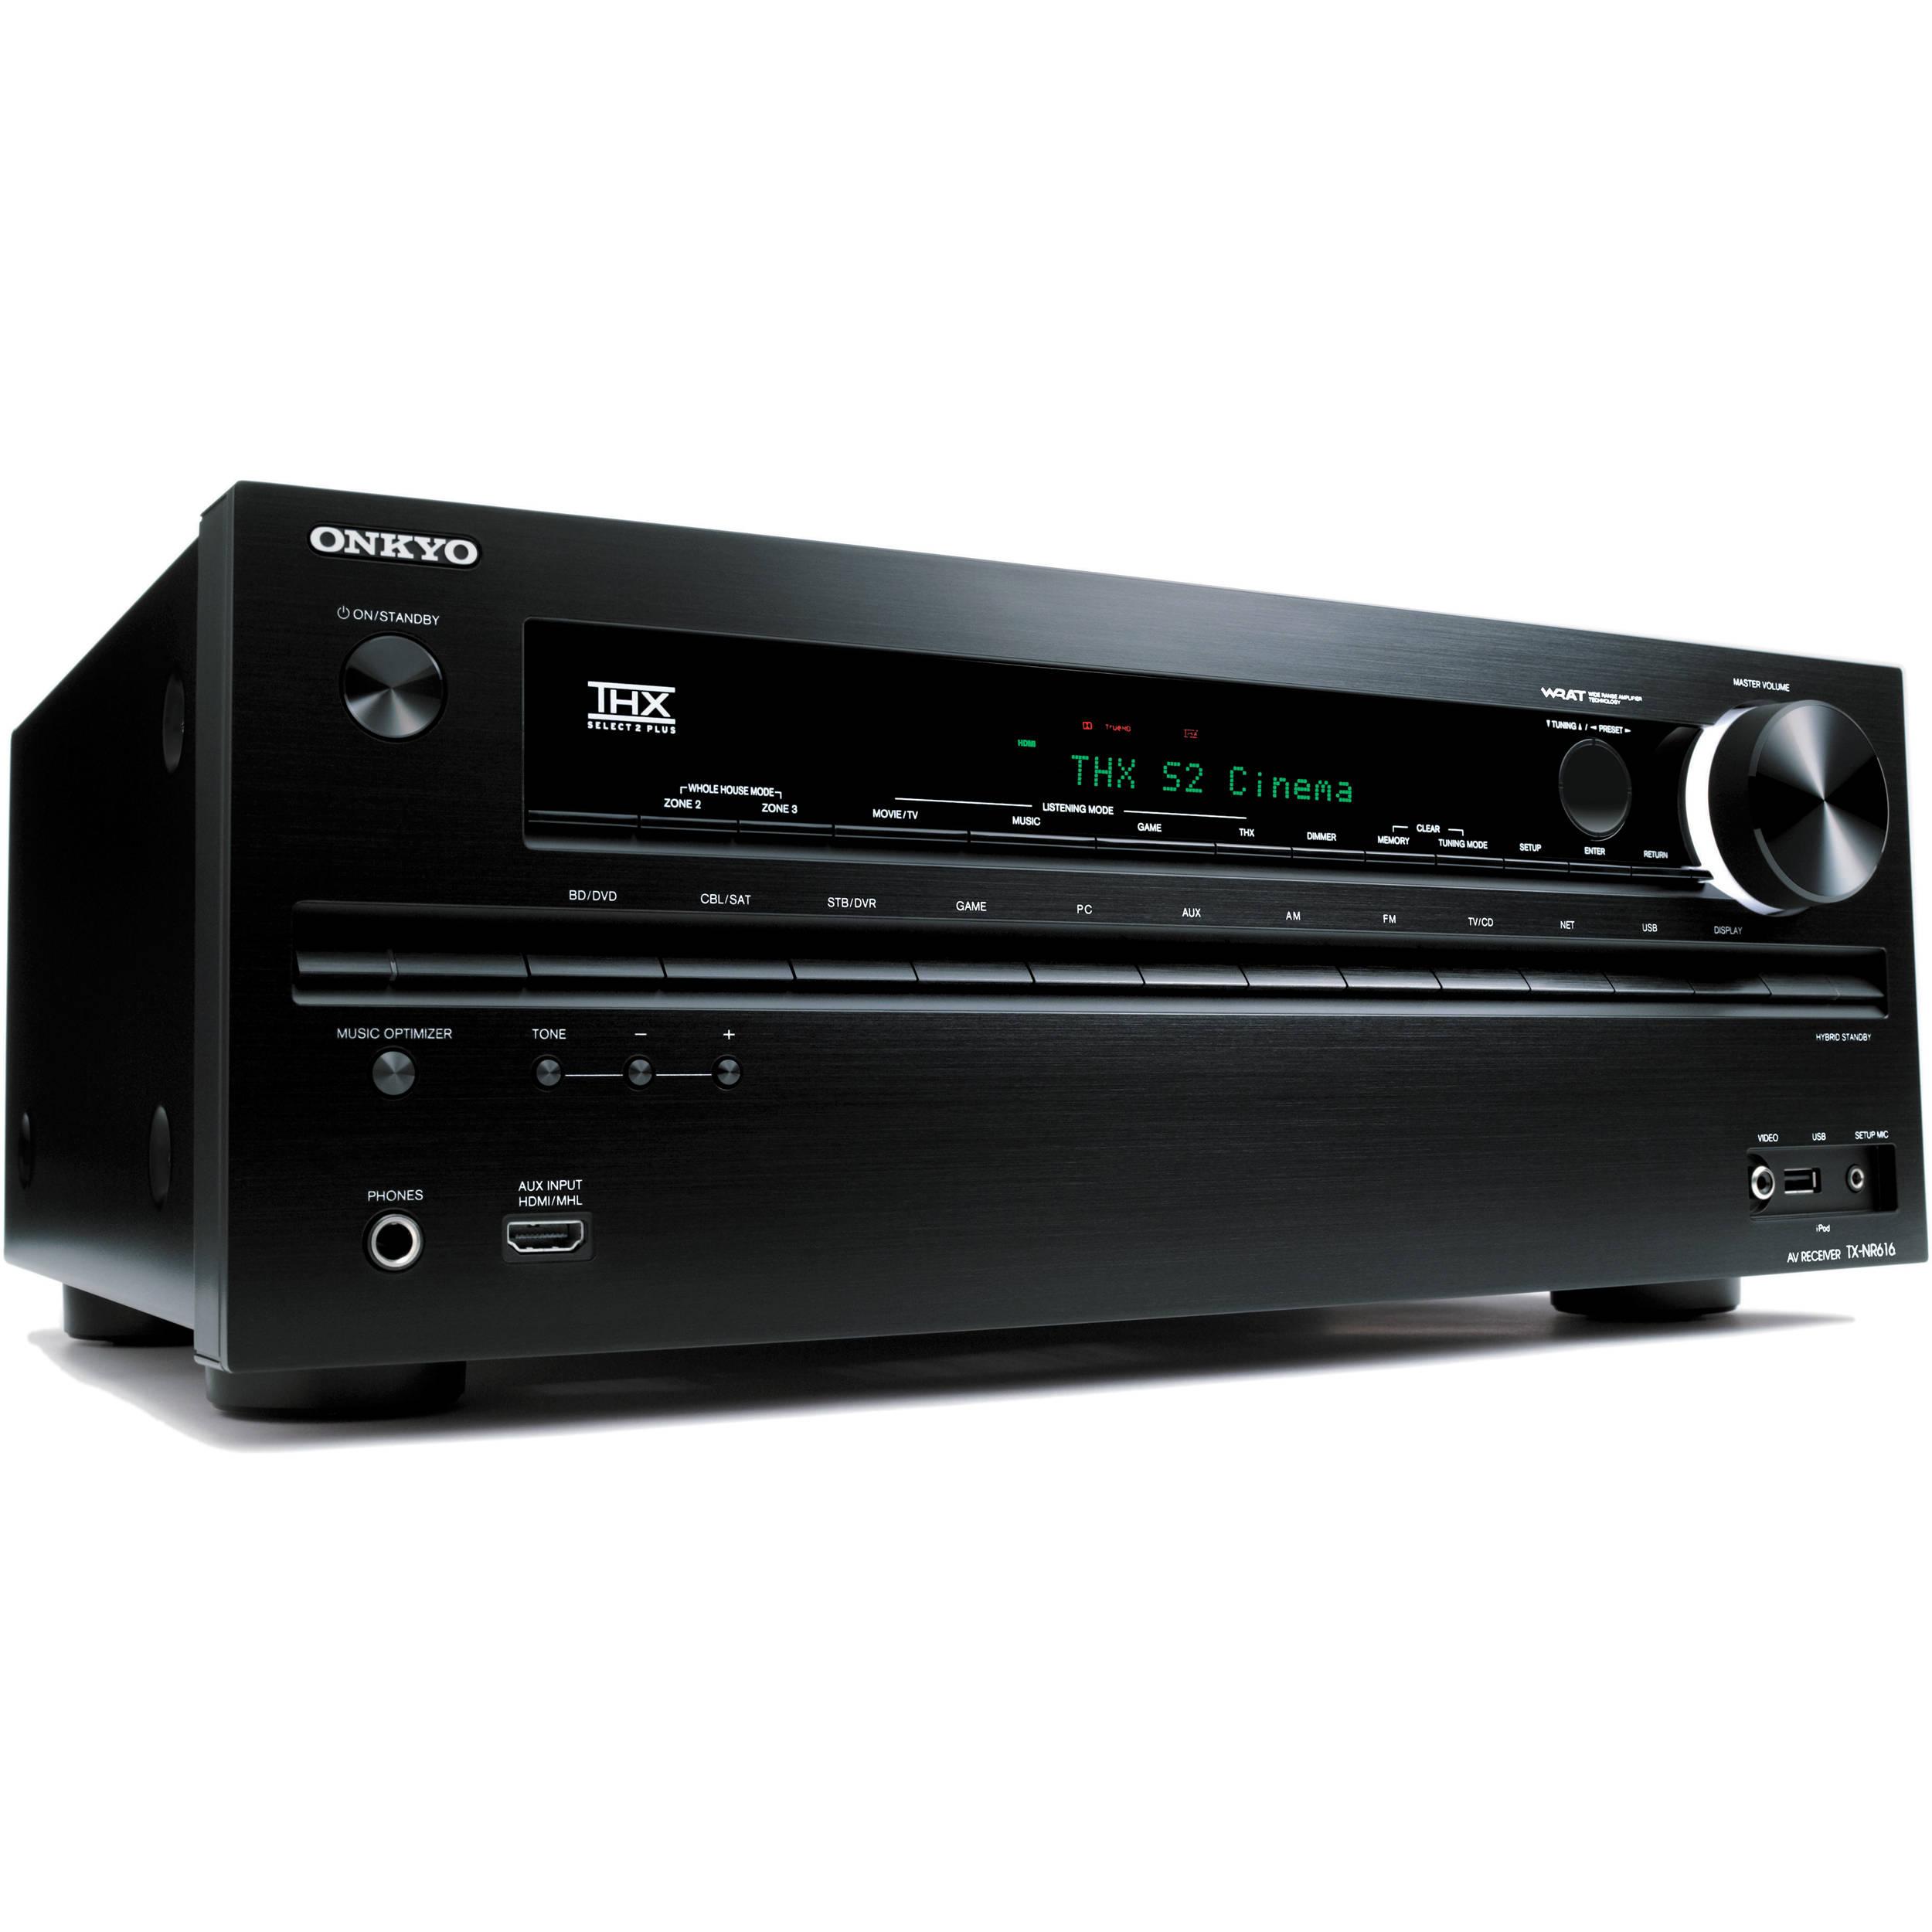 Onkyo TX-NR616 A/V Home Theater Receiver